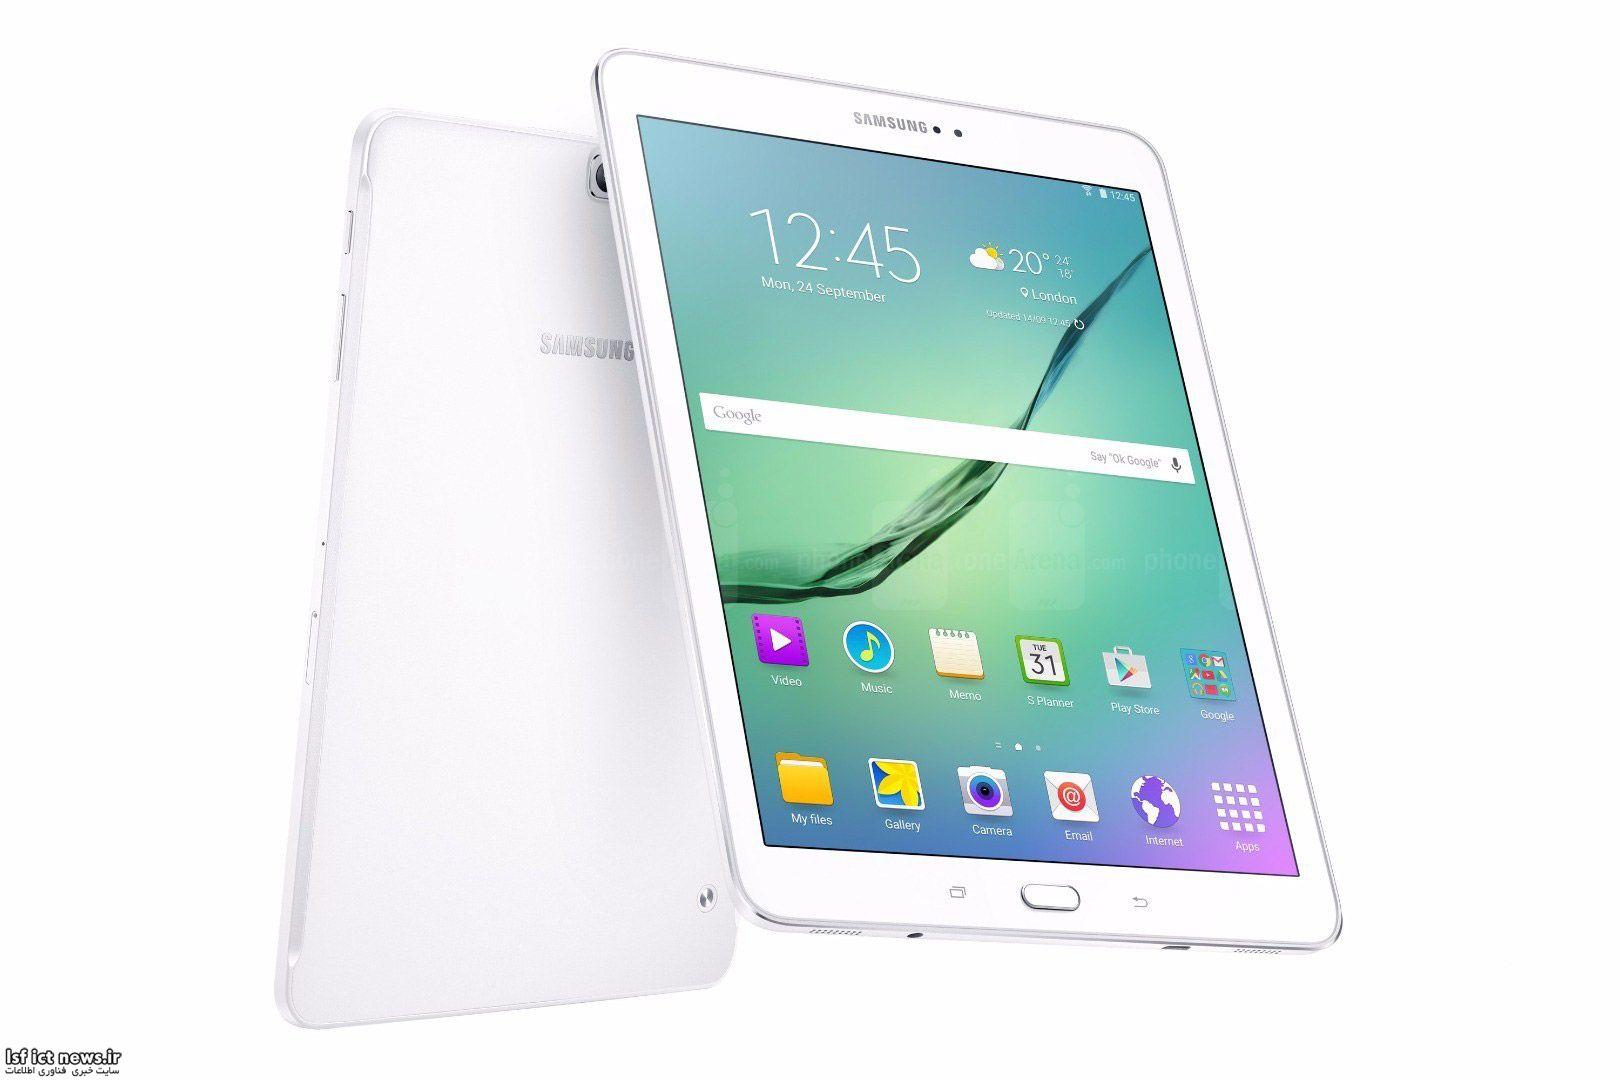 Samsung Galaxy Tab S2 9.7 inch 21